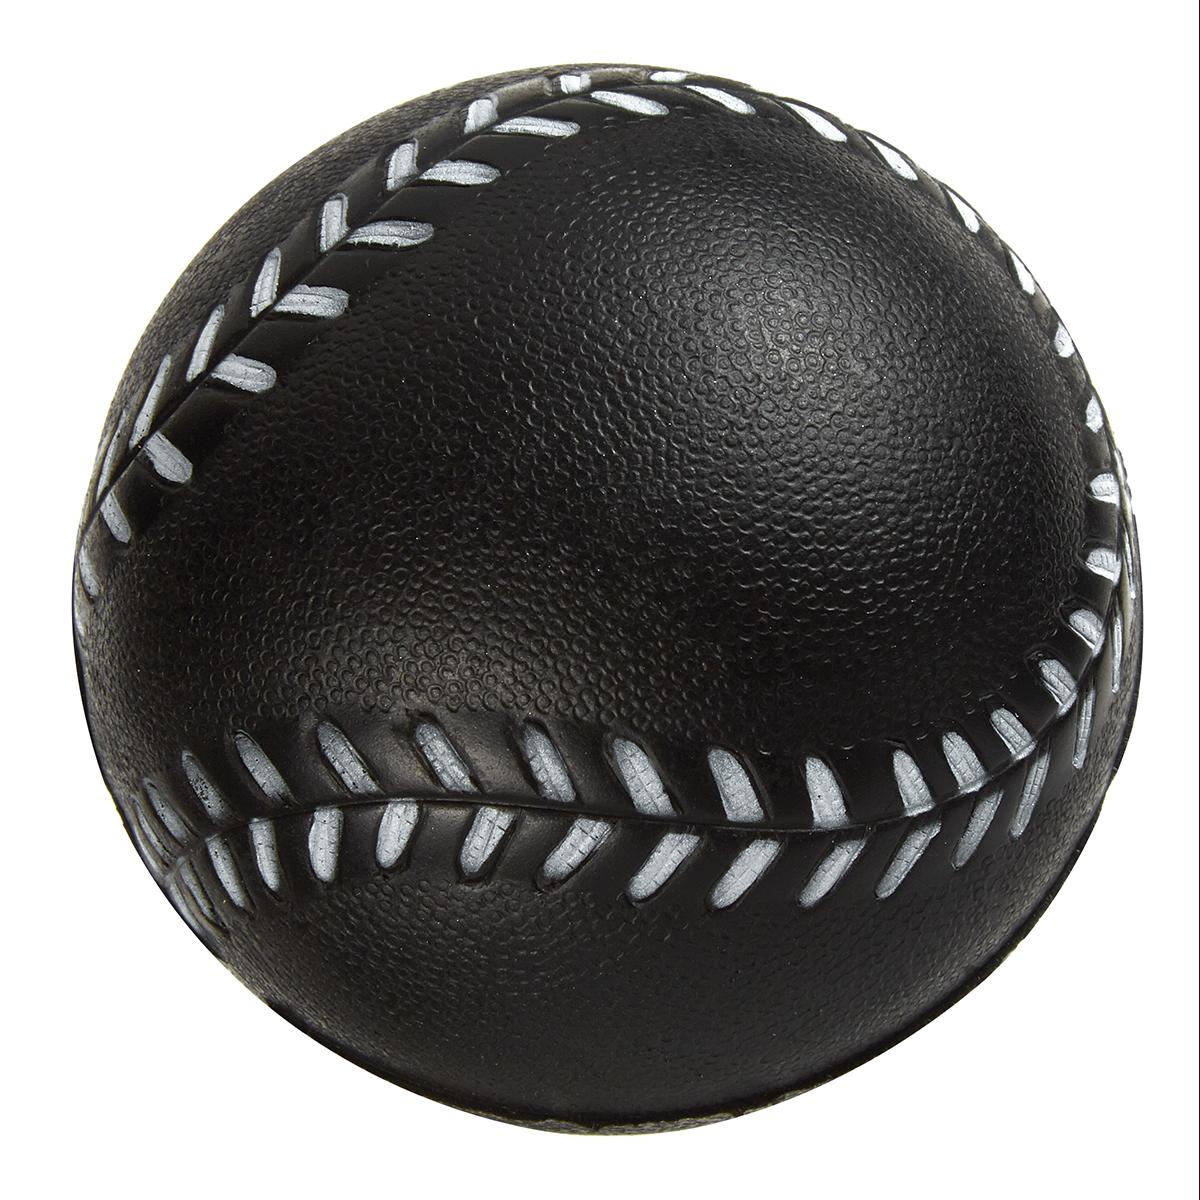 #CM 4090 Baseball Shape Stress Reliever